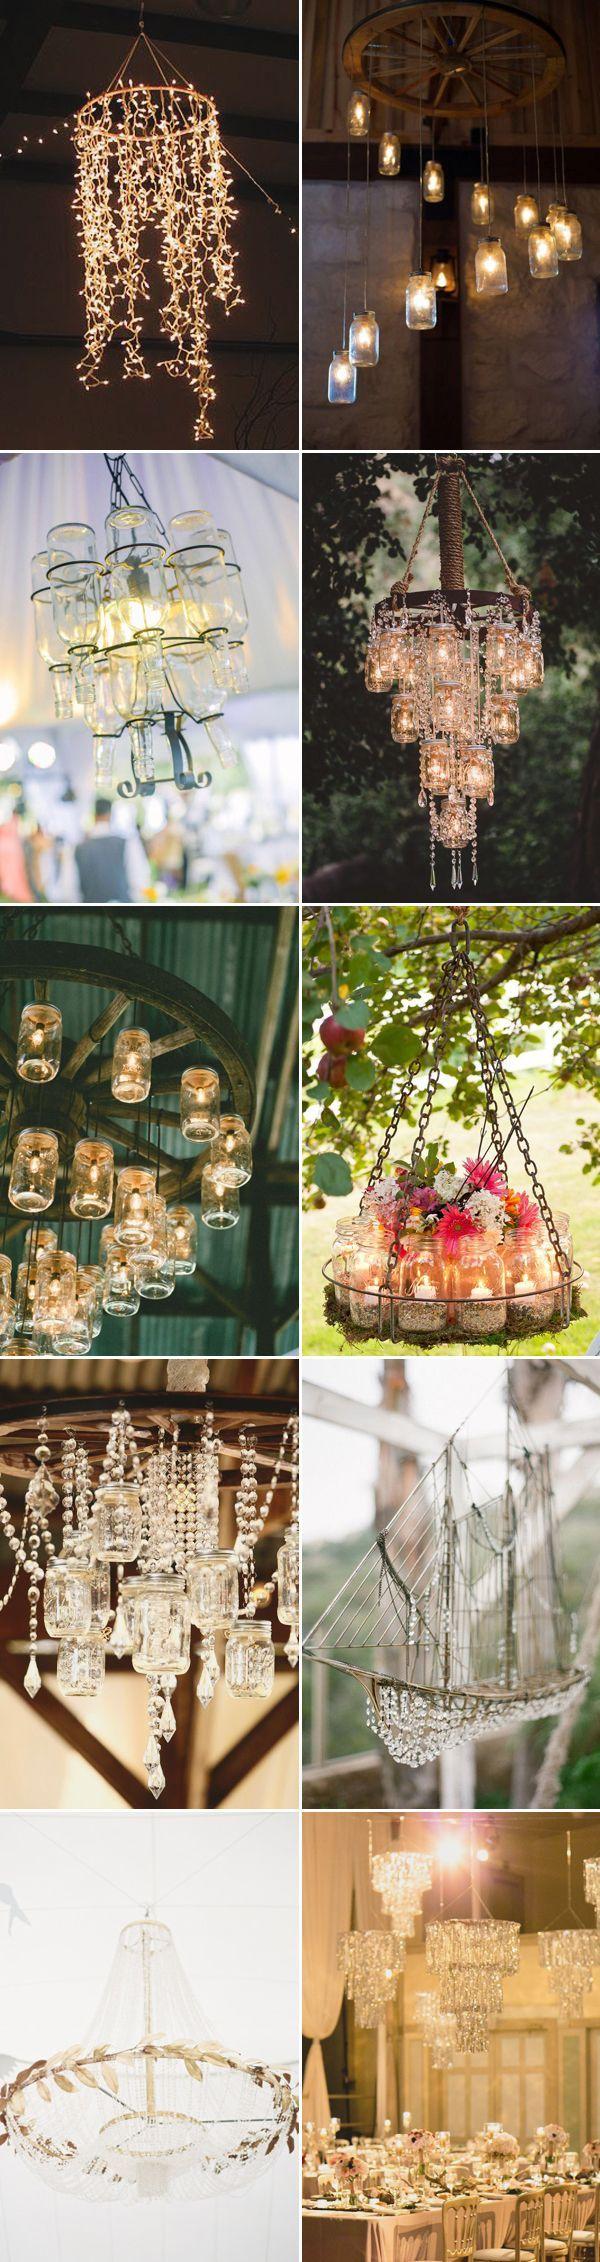 rustic wedding ideas- Creative & DIY Wedding Chandeliers